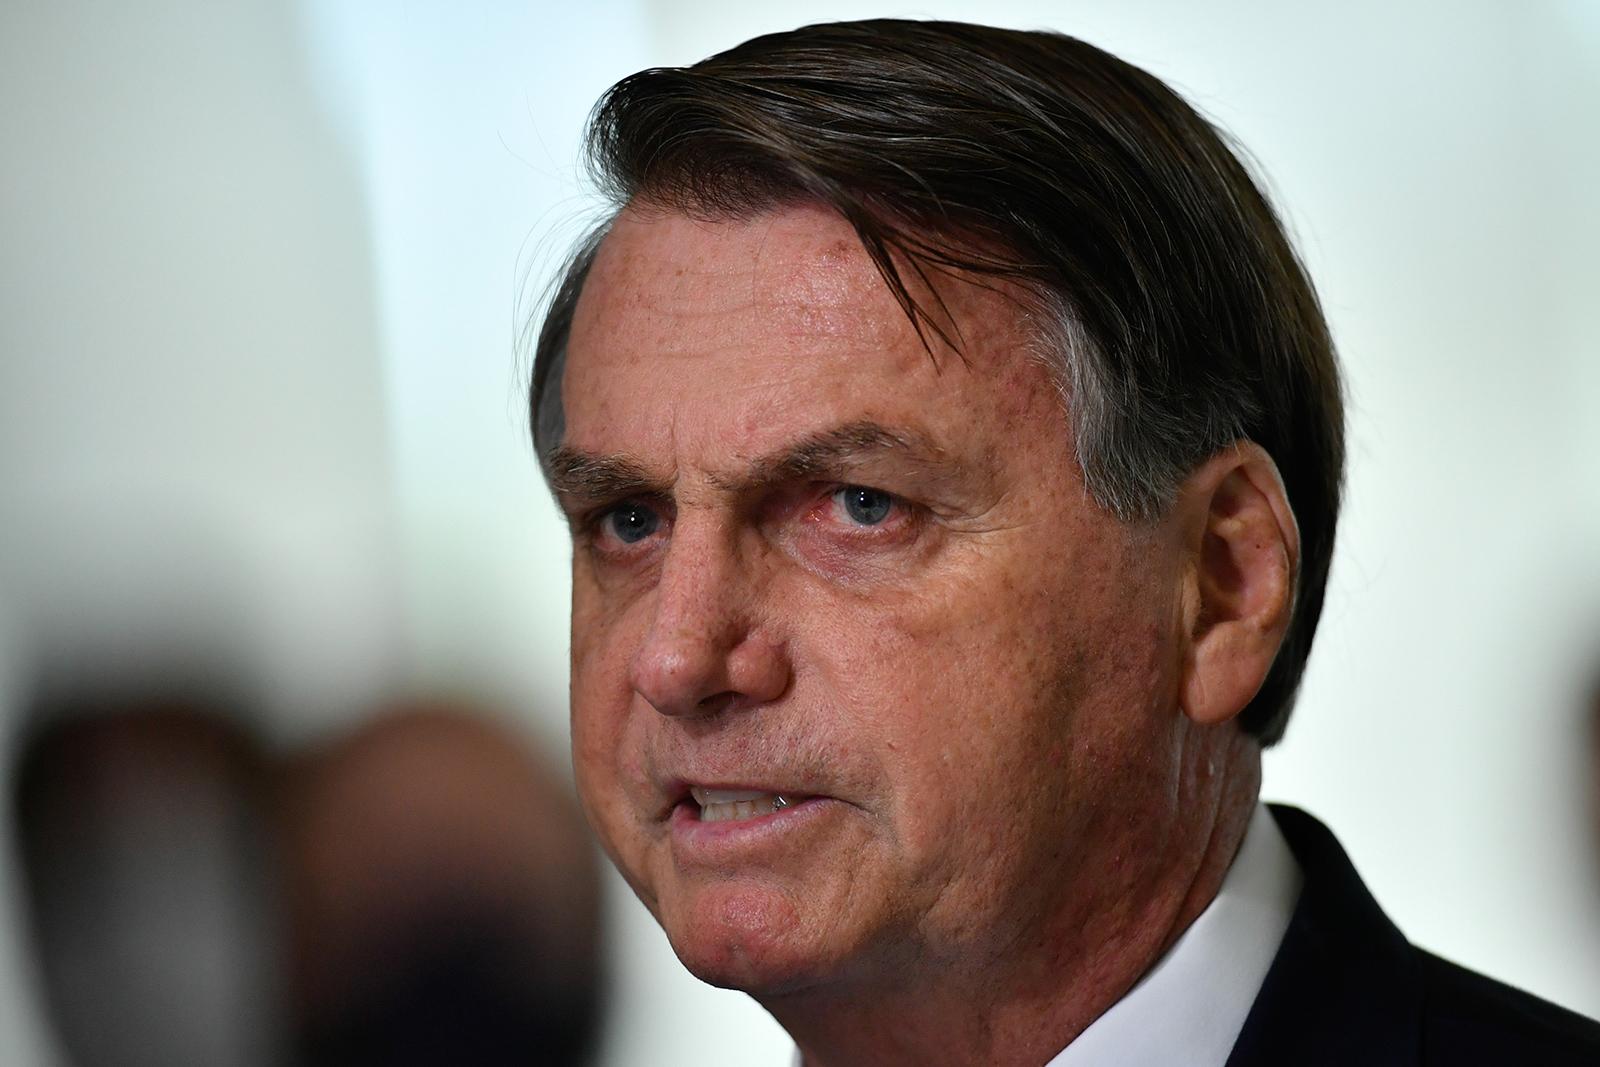 President of Brazil Jair Bolsonaro speaks at the Planalto Palace, Brasilia, Brazil, on March 31.